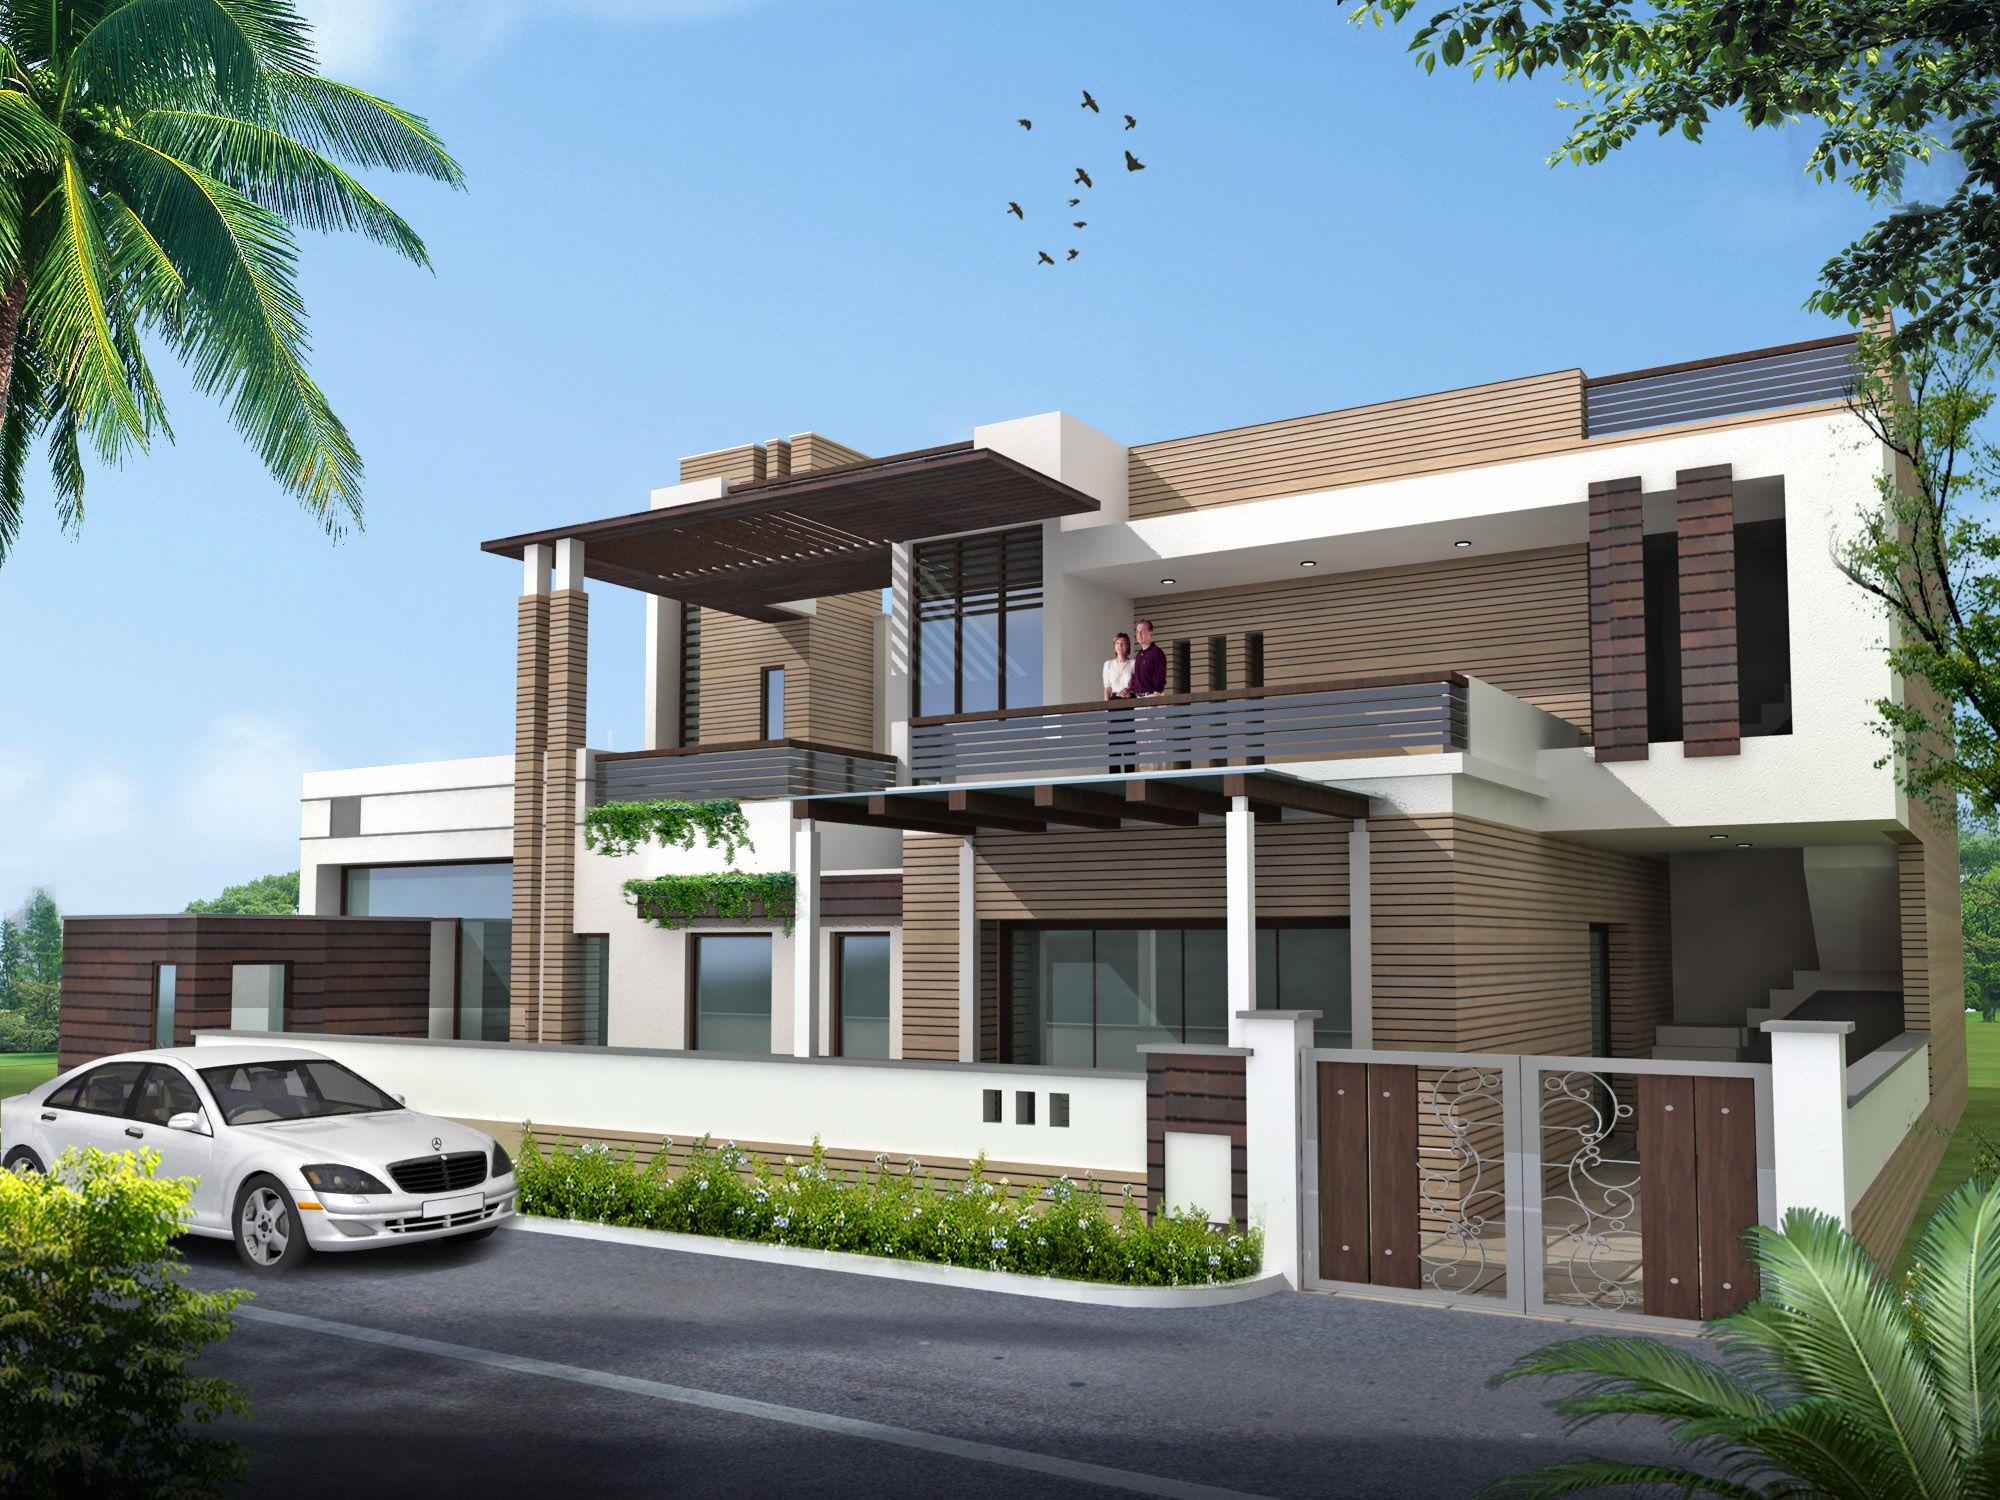 Pleasant 17 Best Images About House Designs On Pinterest House Plans Largest Home Design Picture Inspirations Pitcheantrous